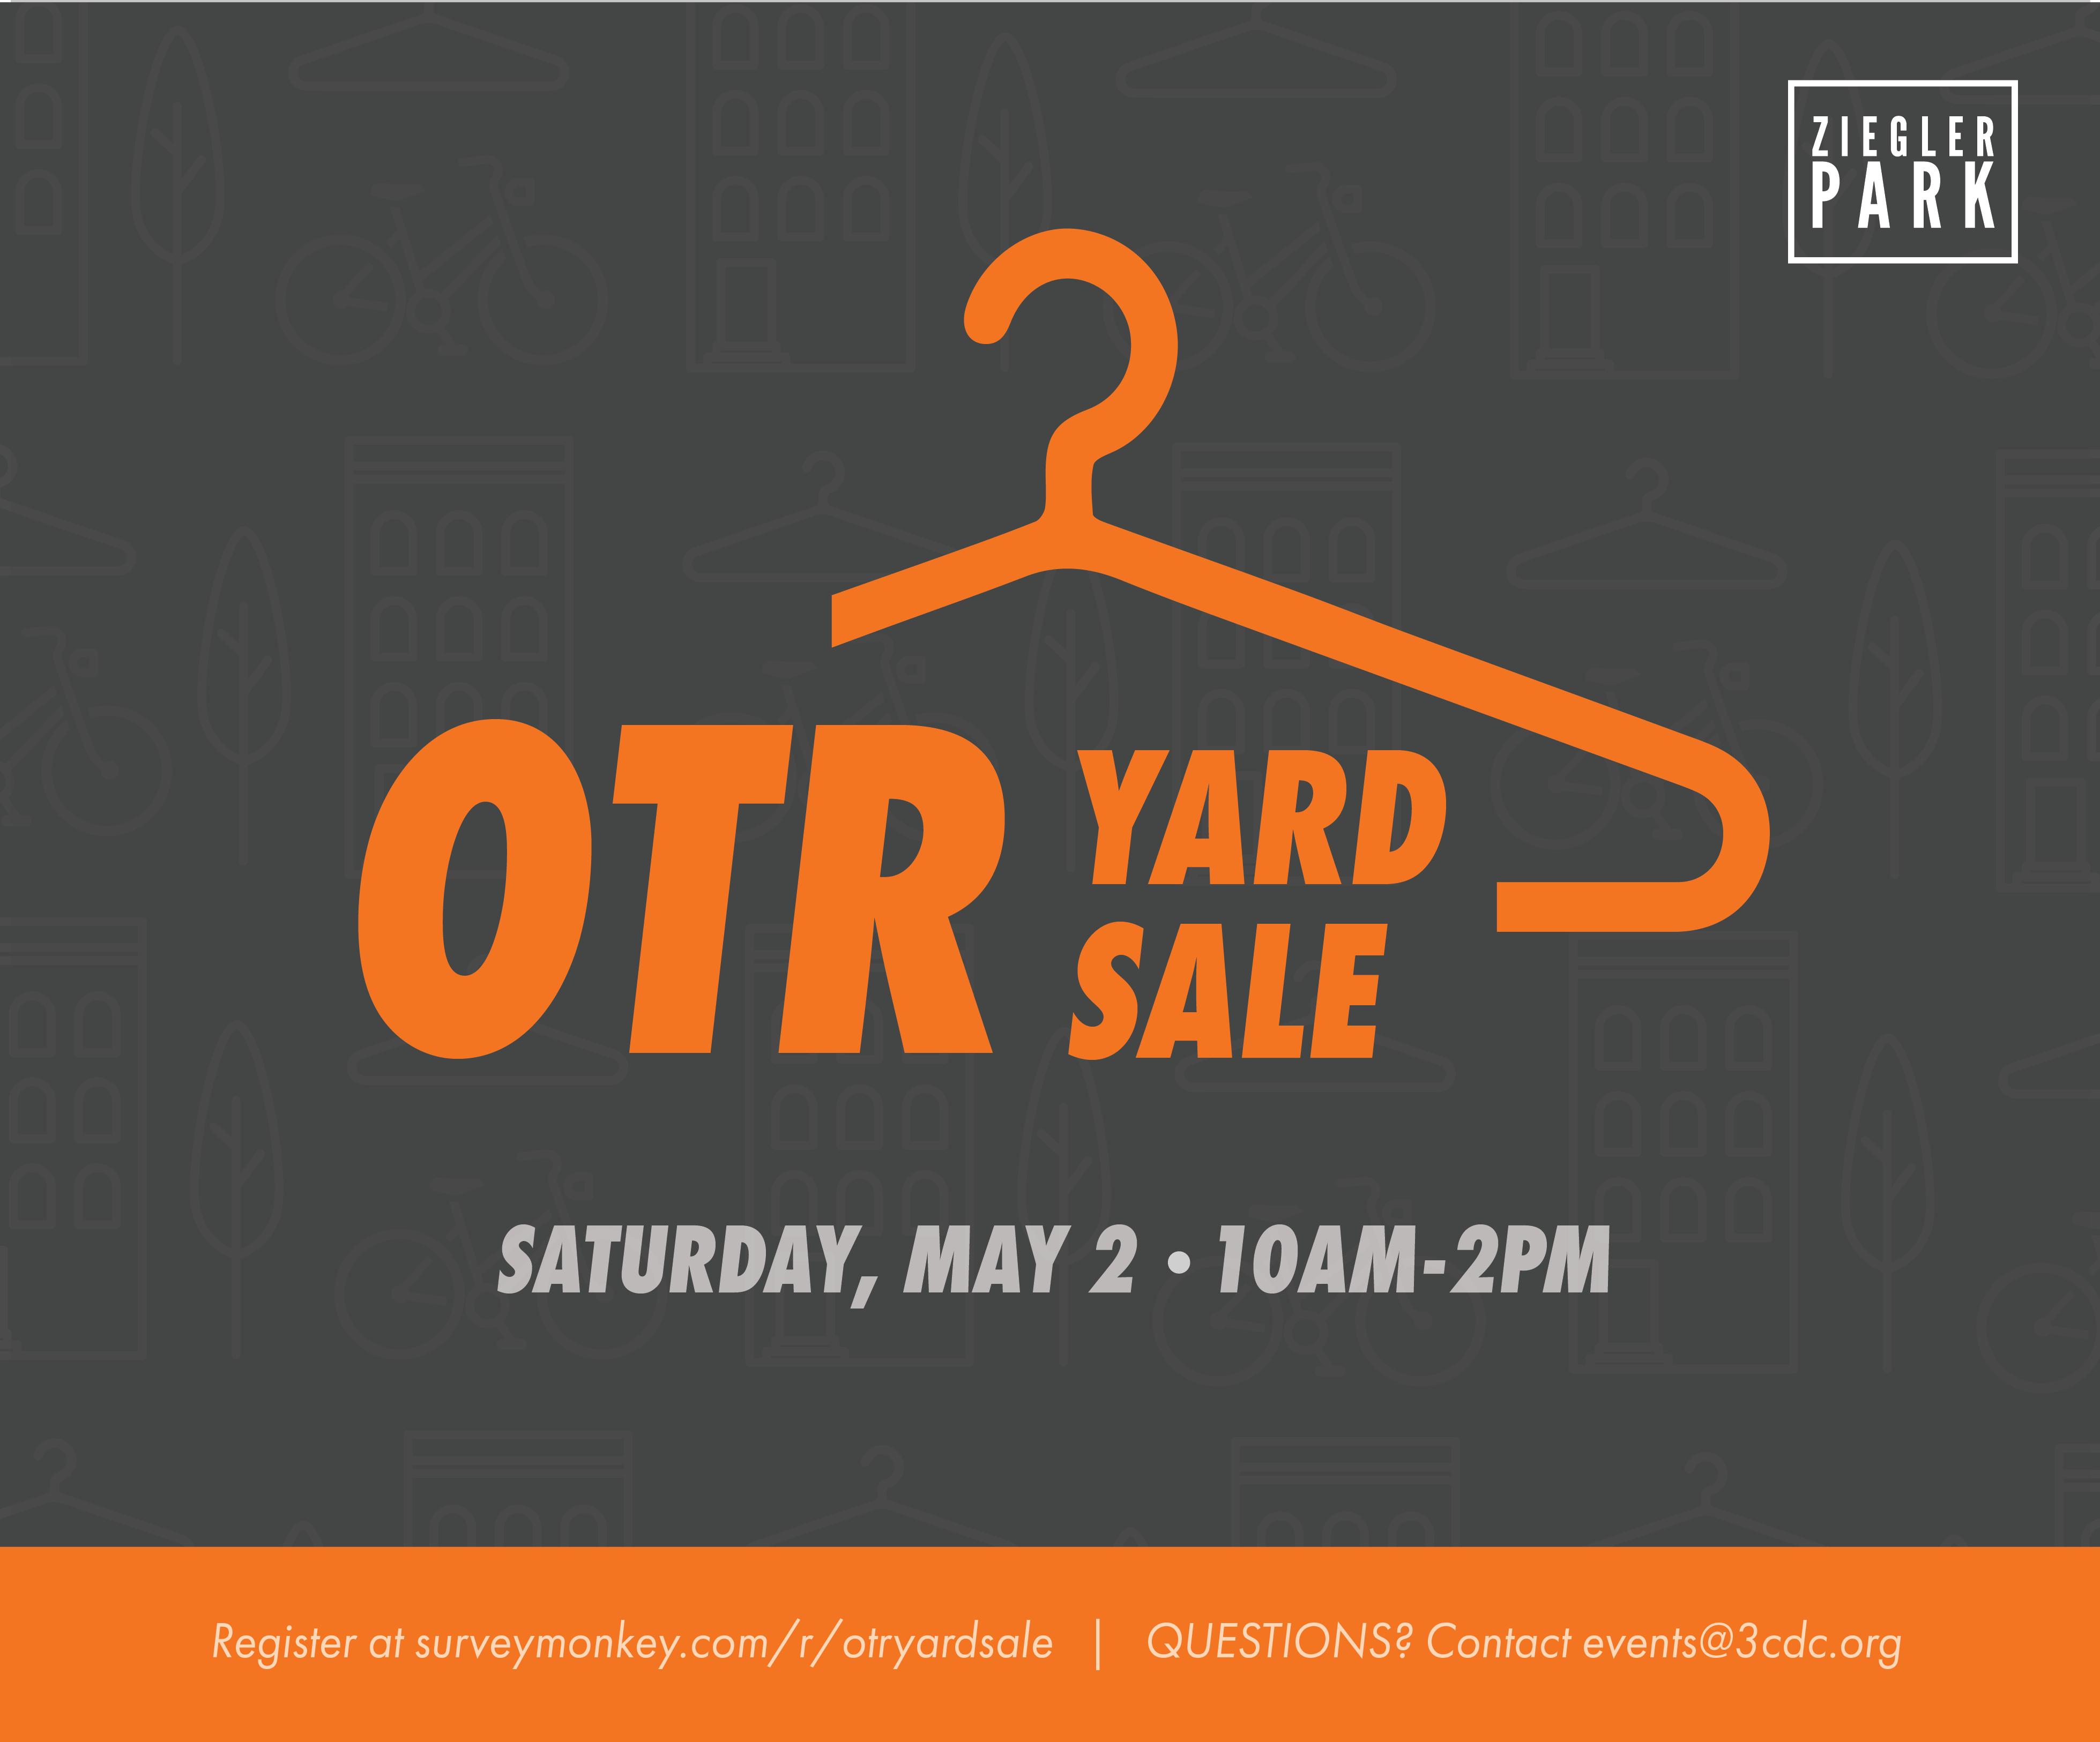 CANCELLED: OTR Yard Sale @ Ziegler Park